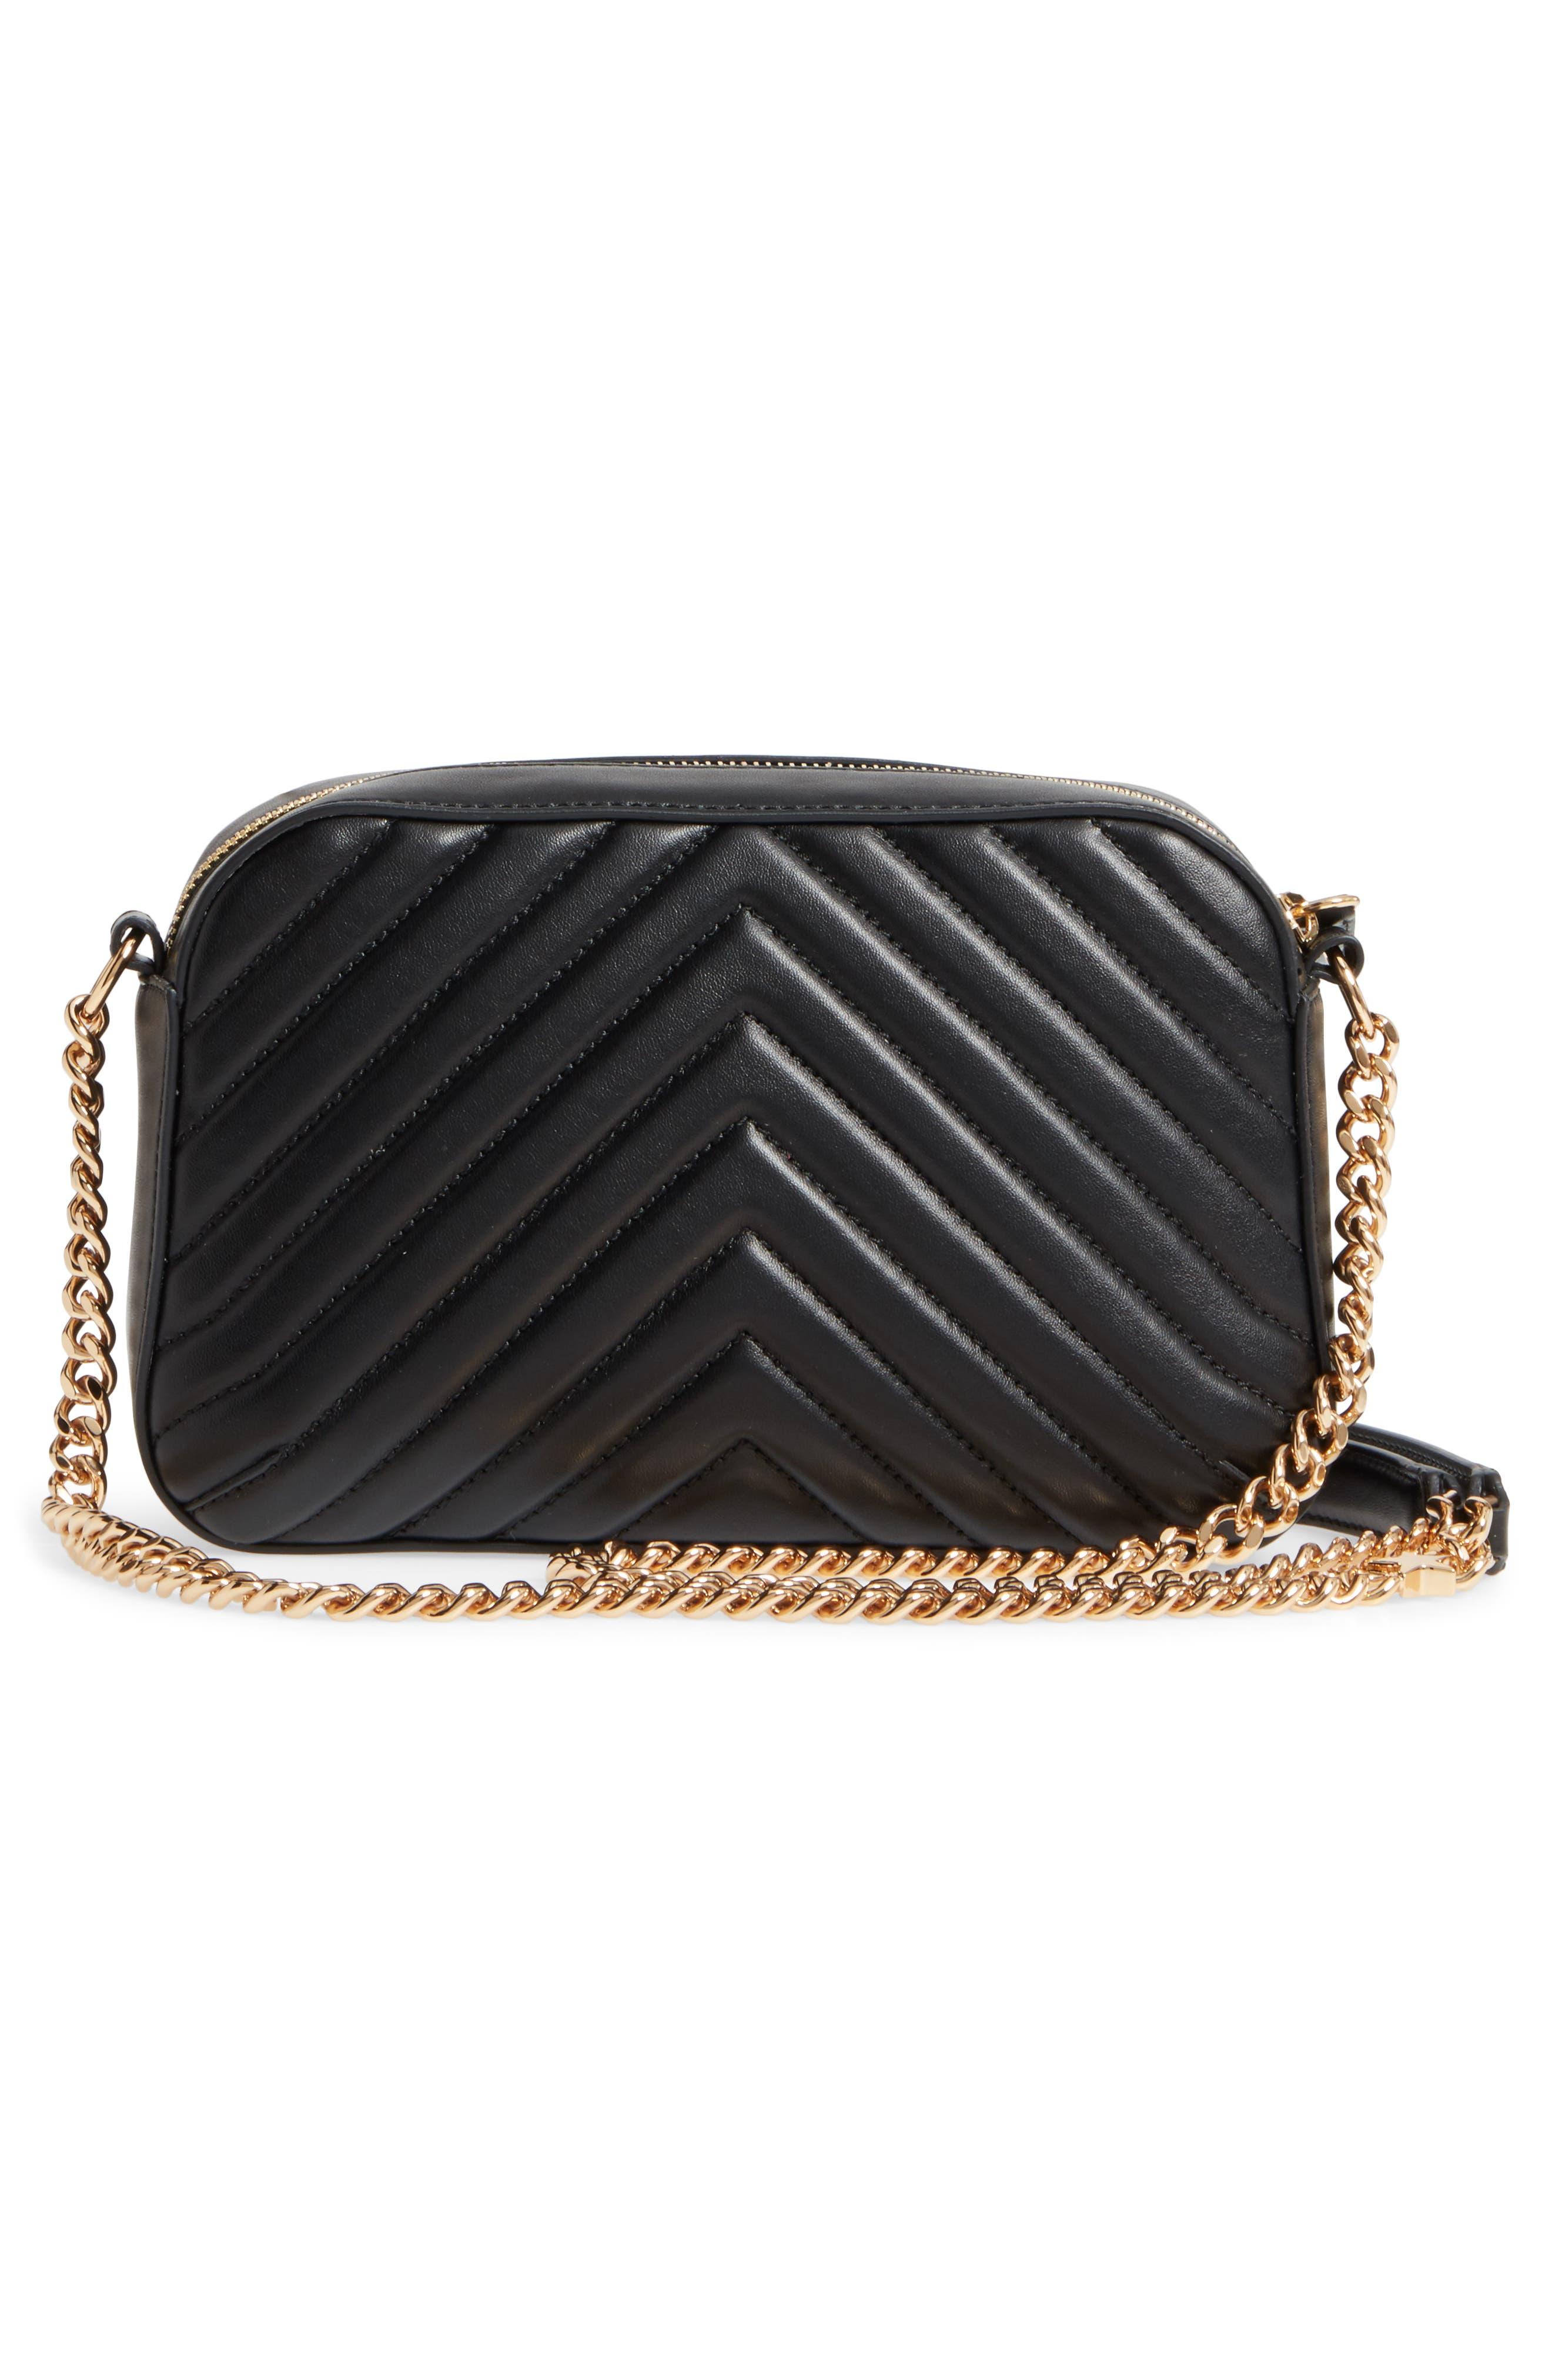 Alter Nappa Faux Leather Shoulder Bag,                             Alternate thumbnail 3, color,                             BLACK